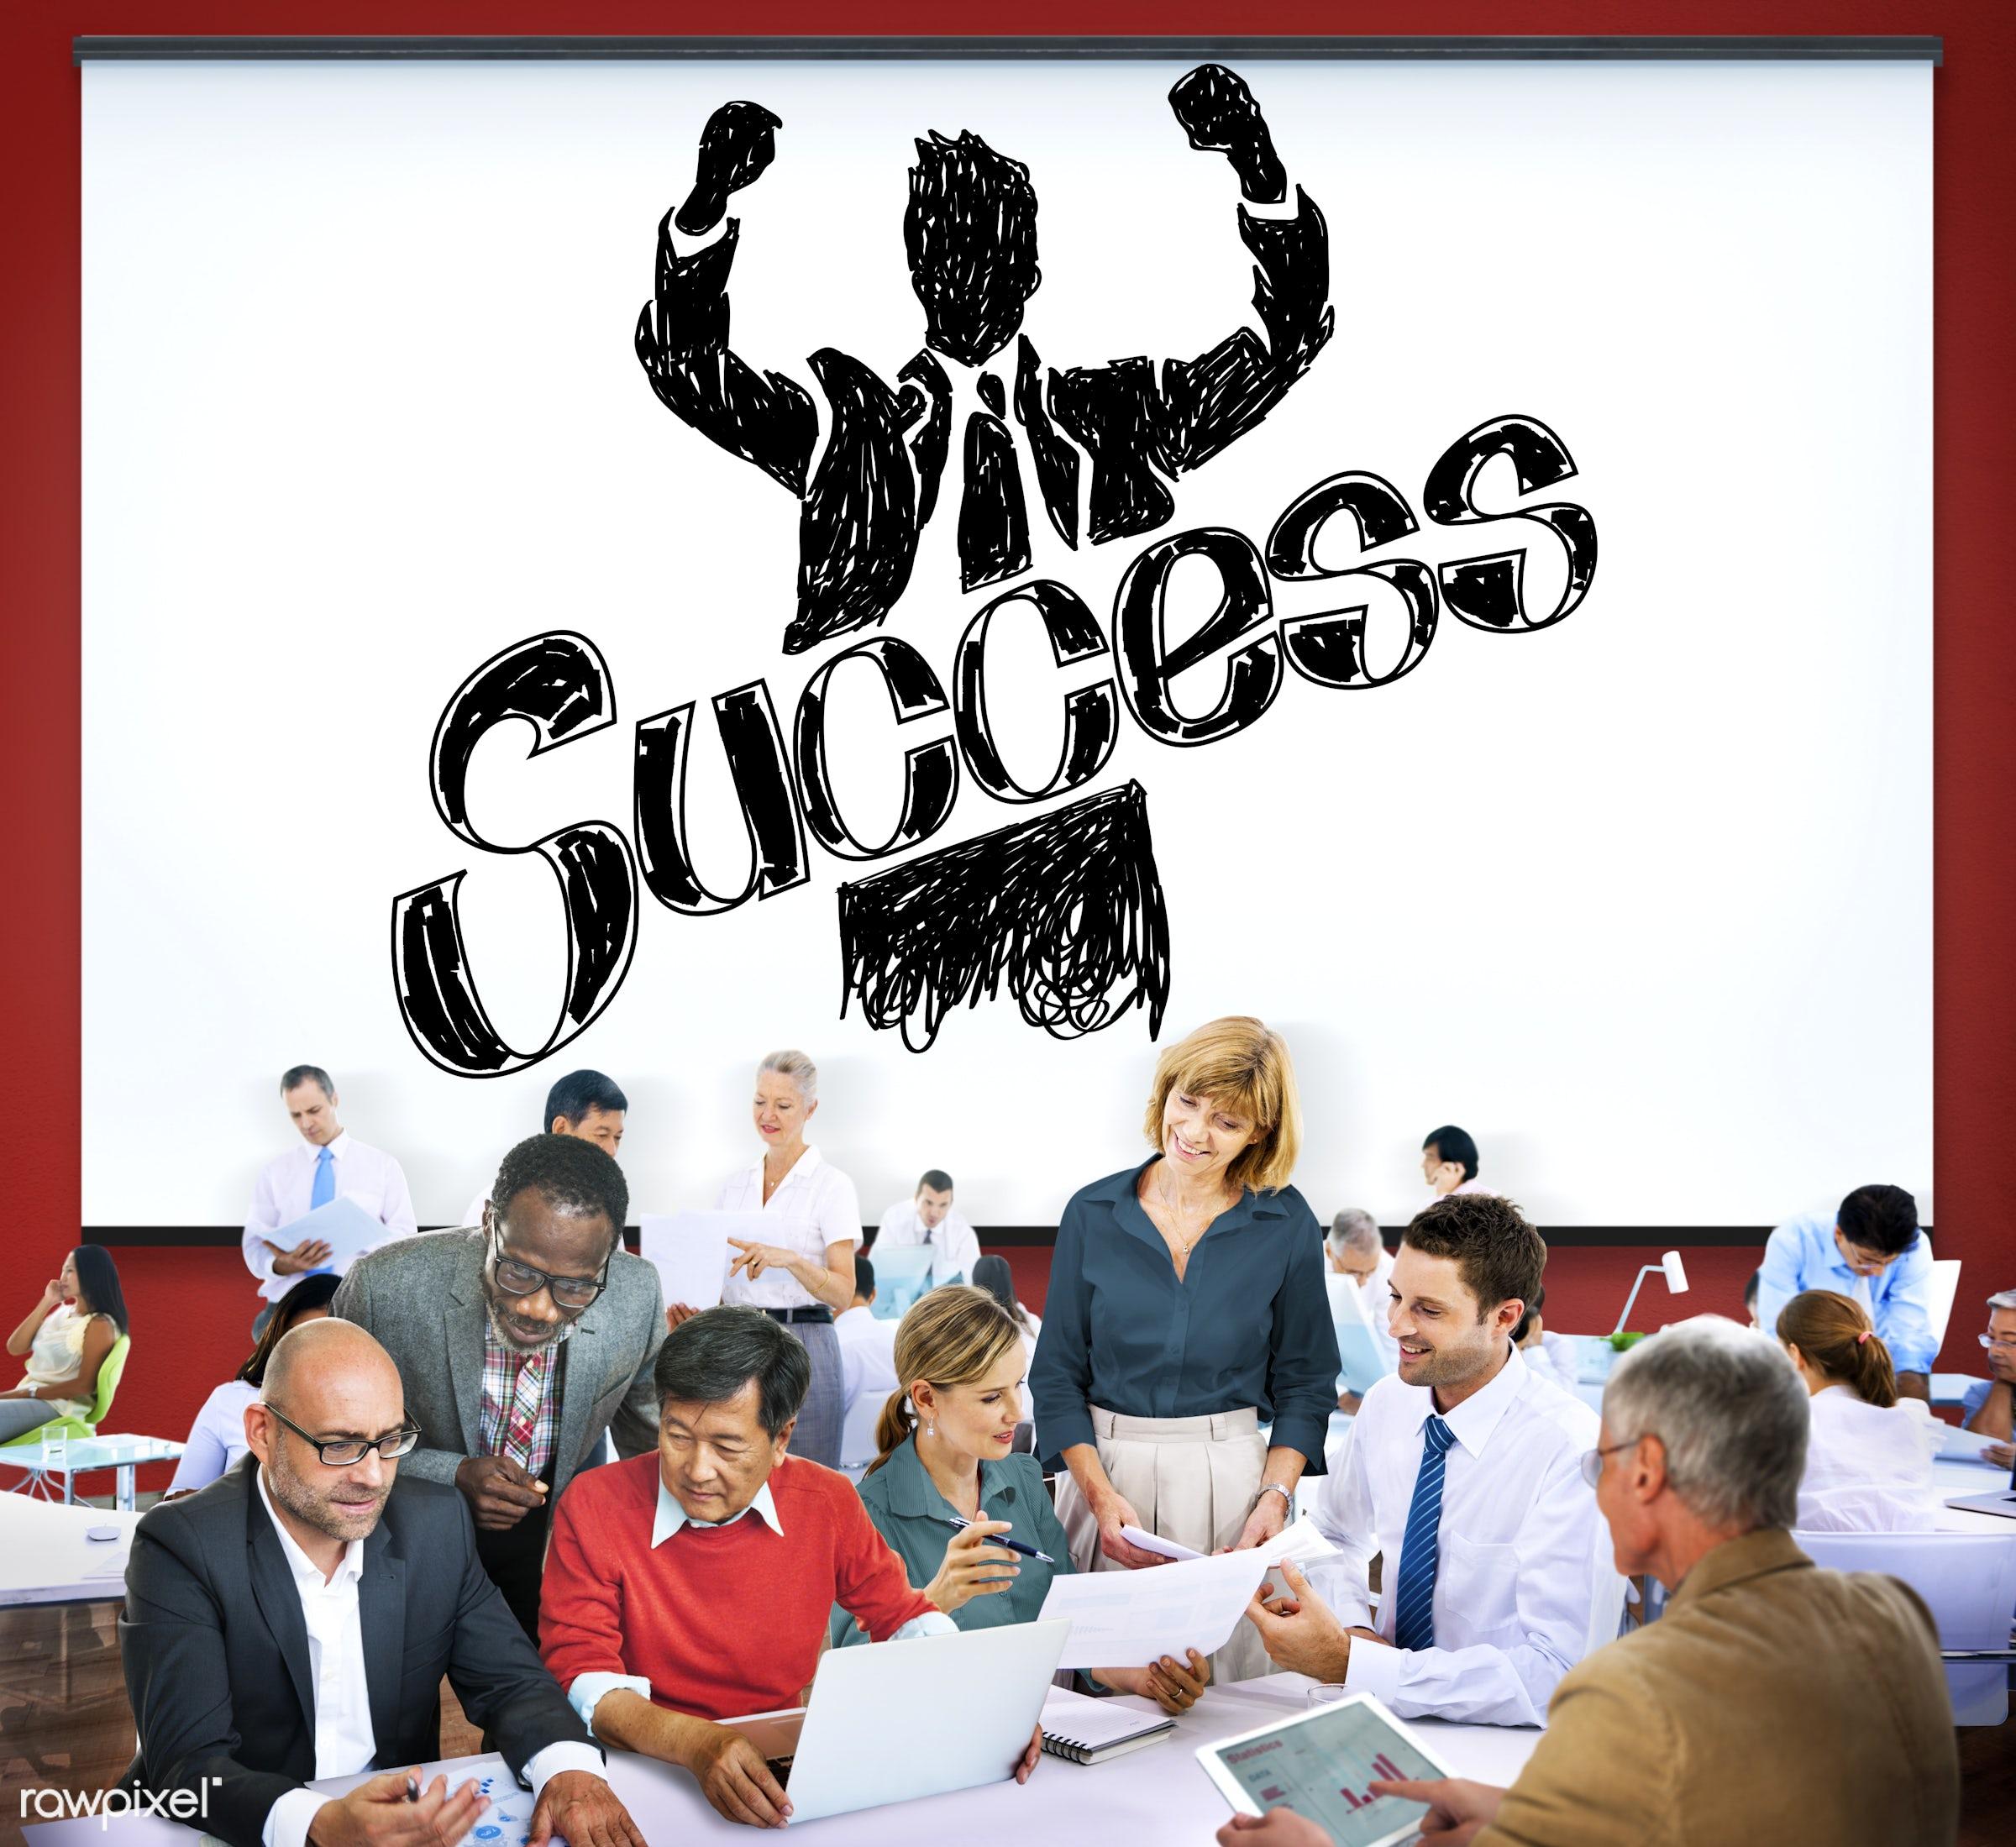 achievement, analysis, award, business, business people, businessman, businessmen, businesswomen, busy, communication,...